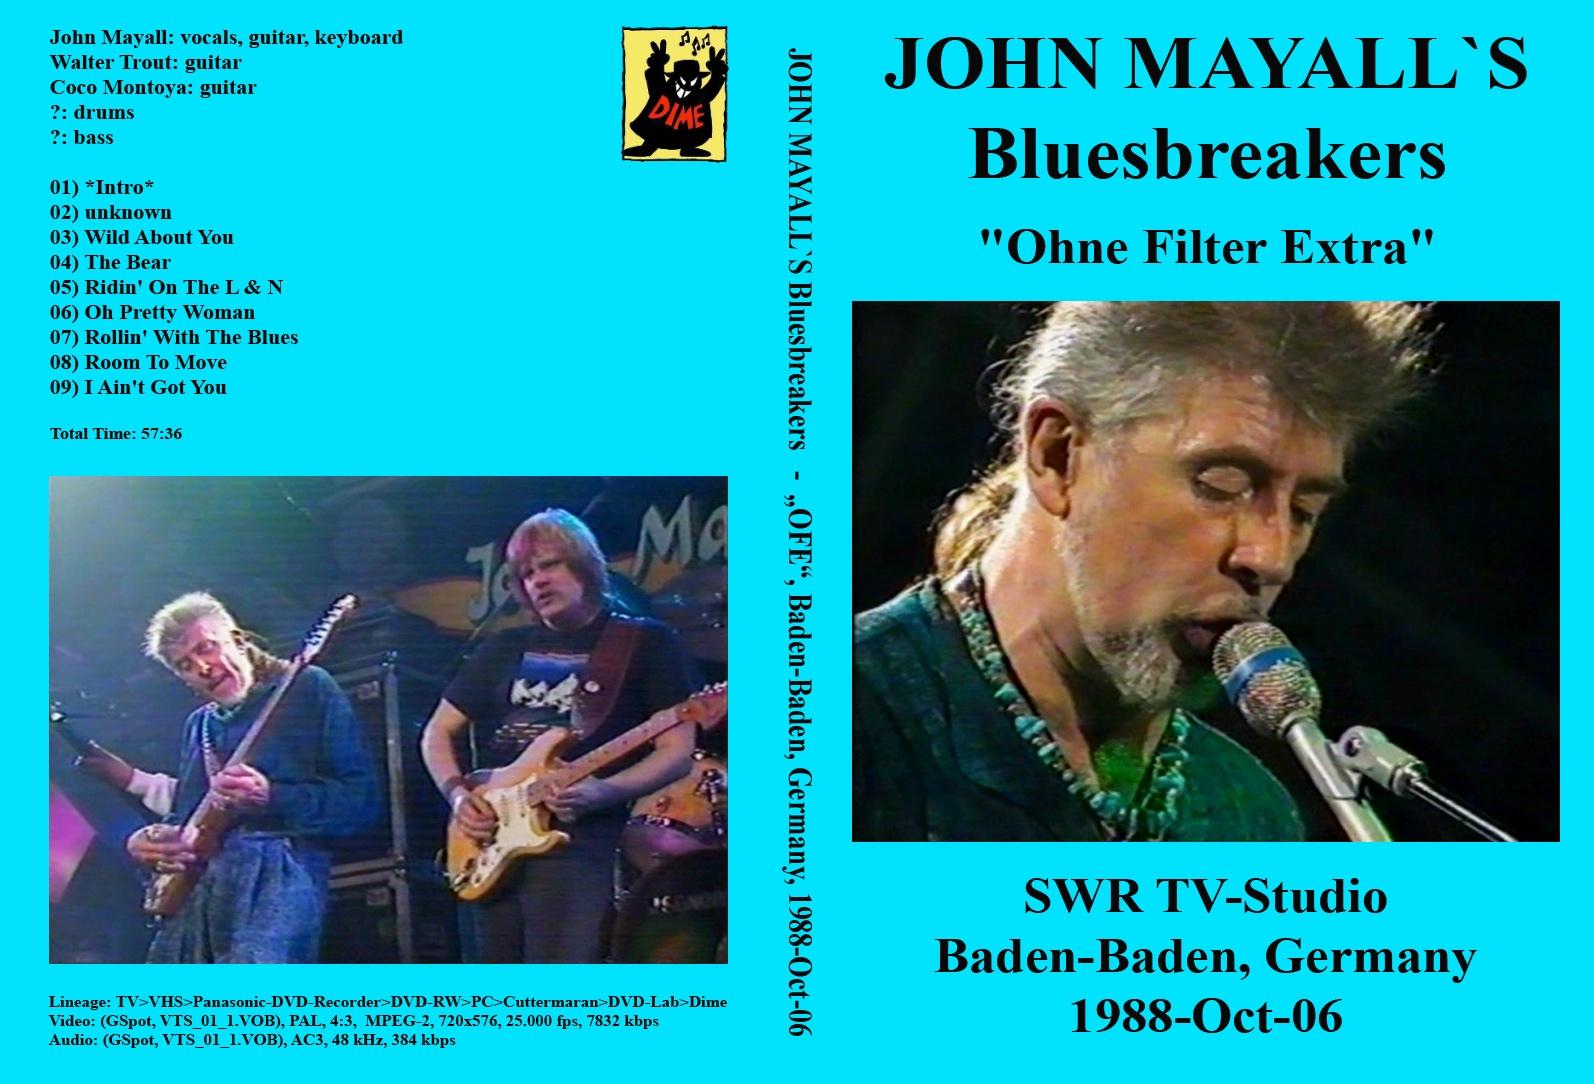 John Mayall & The Bluesbreakers* John Mayall's Bluesbreakers - The Diary Of A Band, Volume One